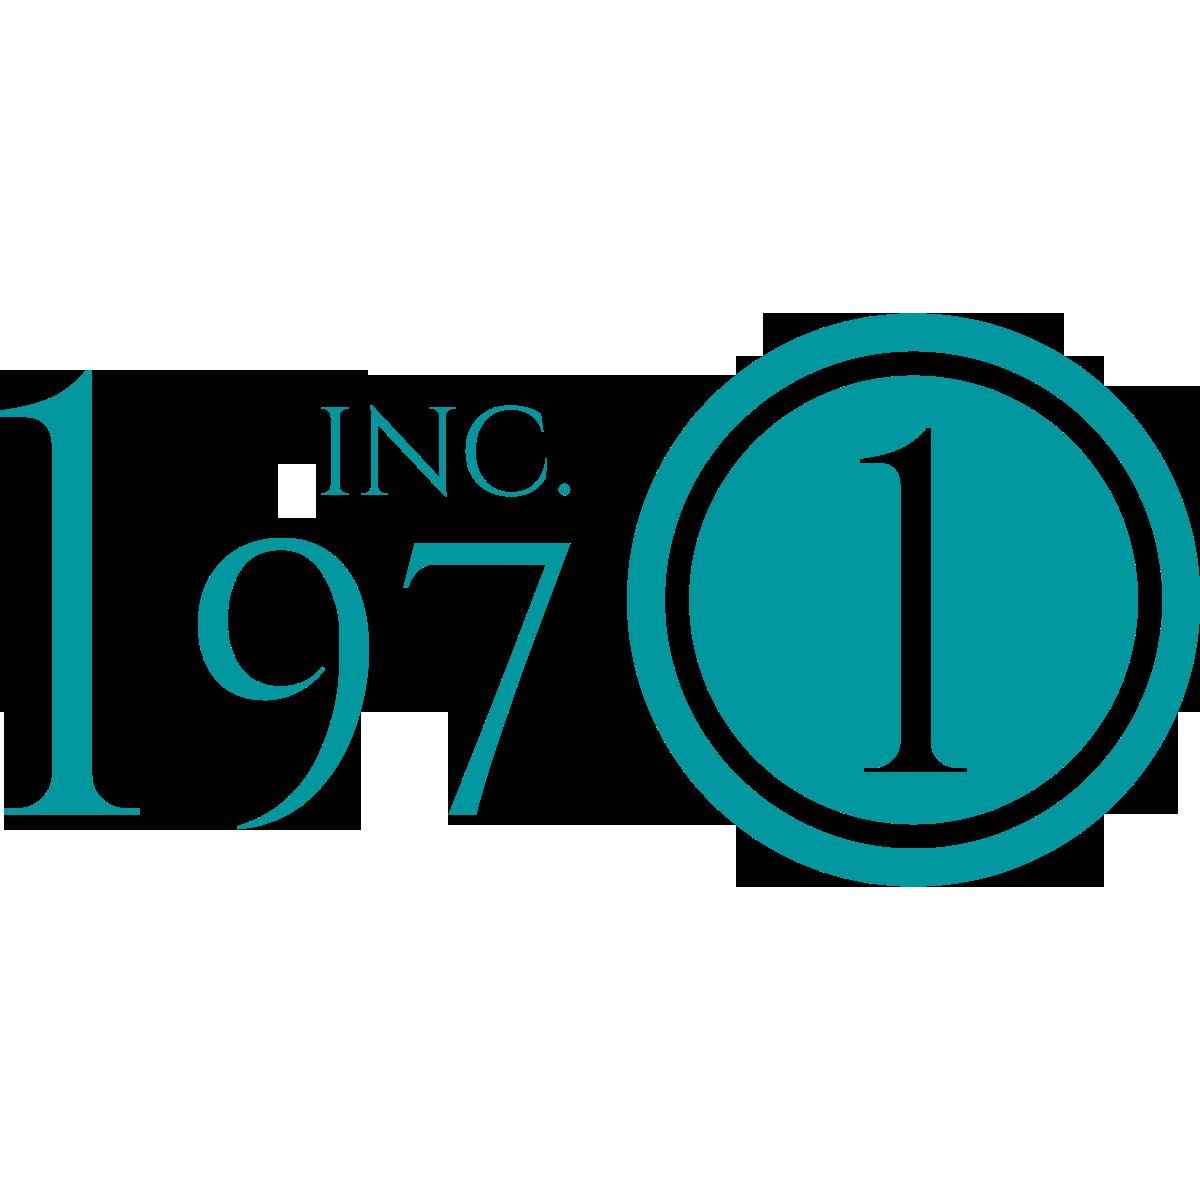 197inc